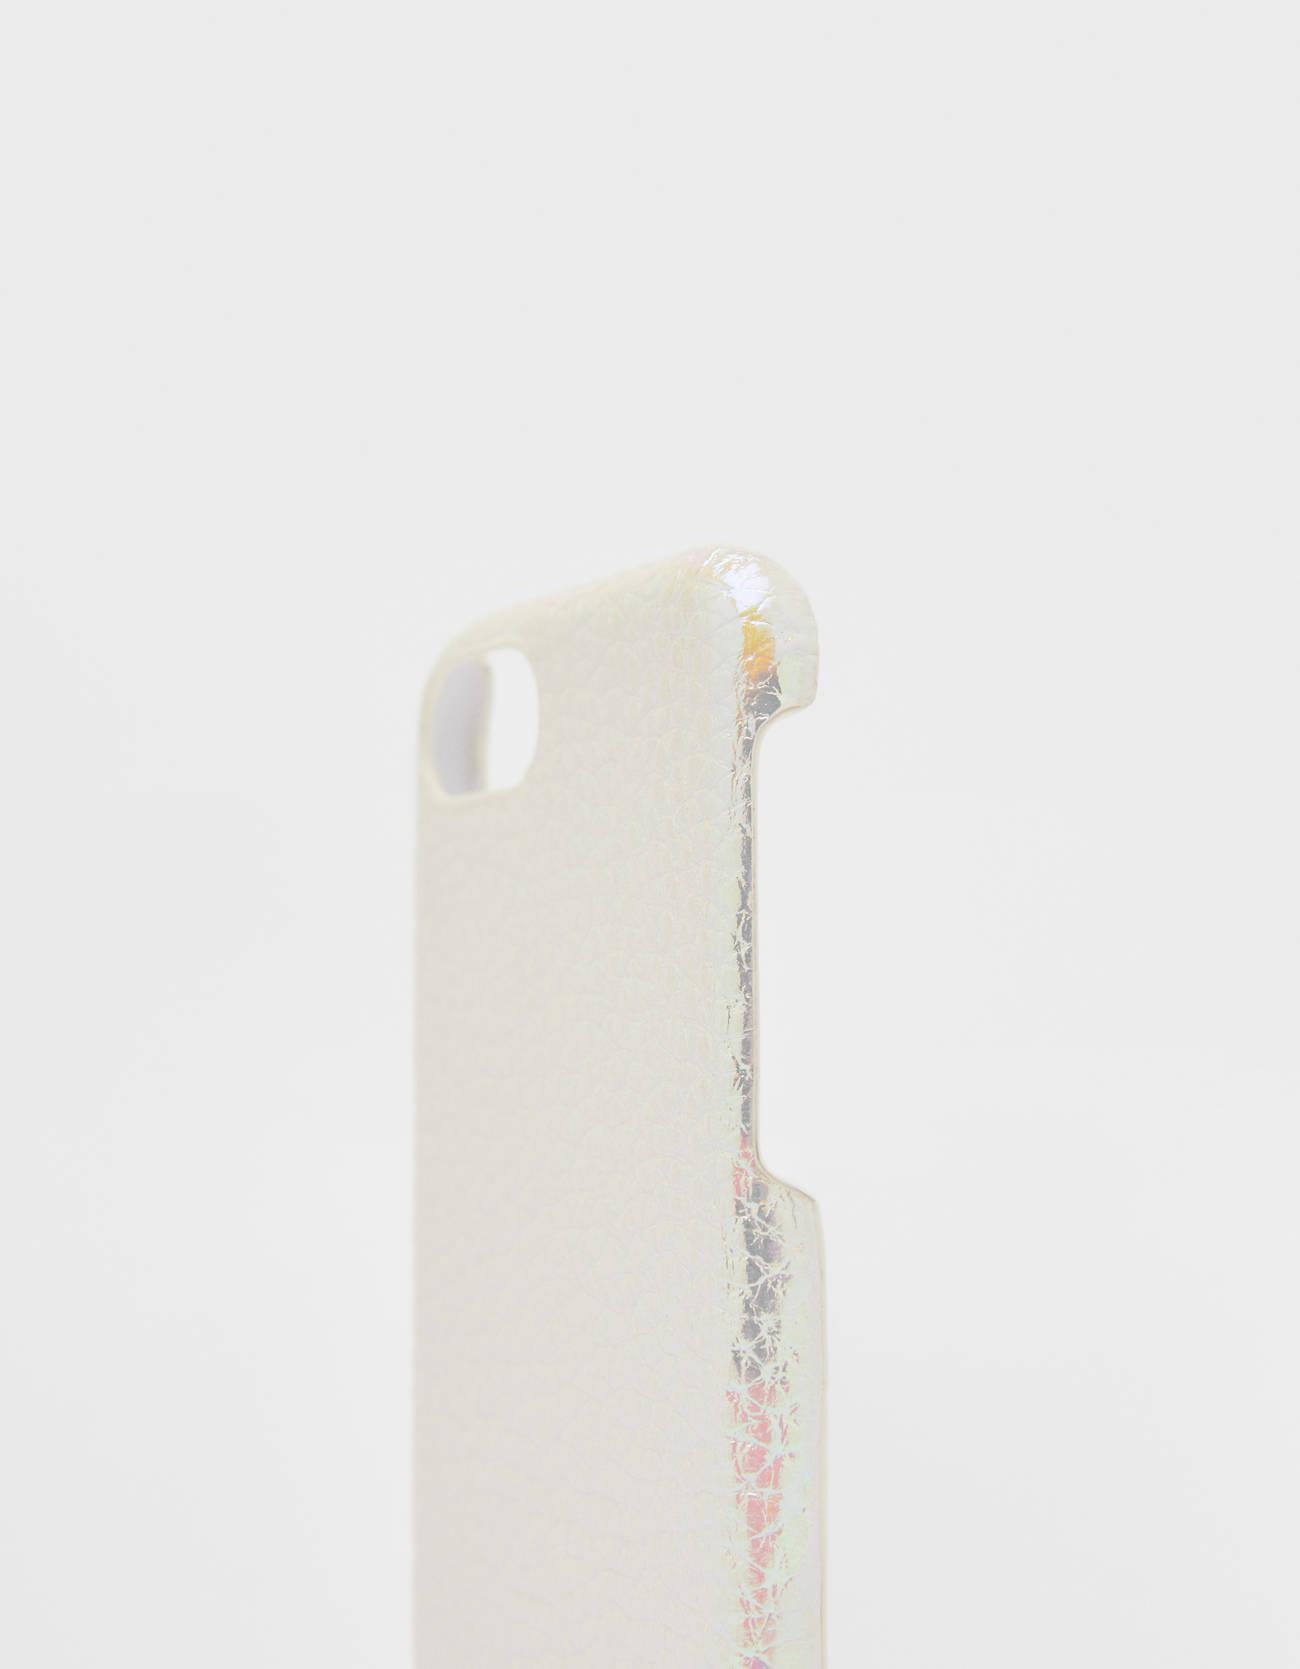 coque adhesive iphone 6